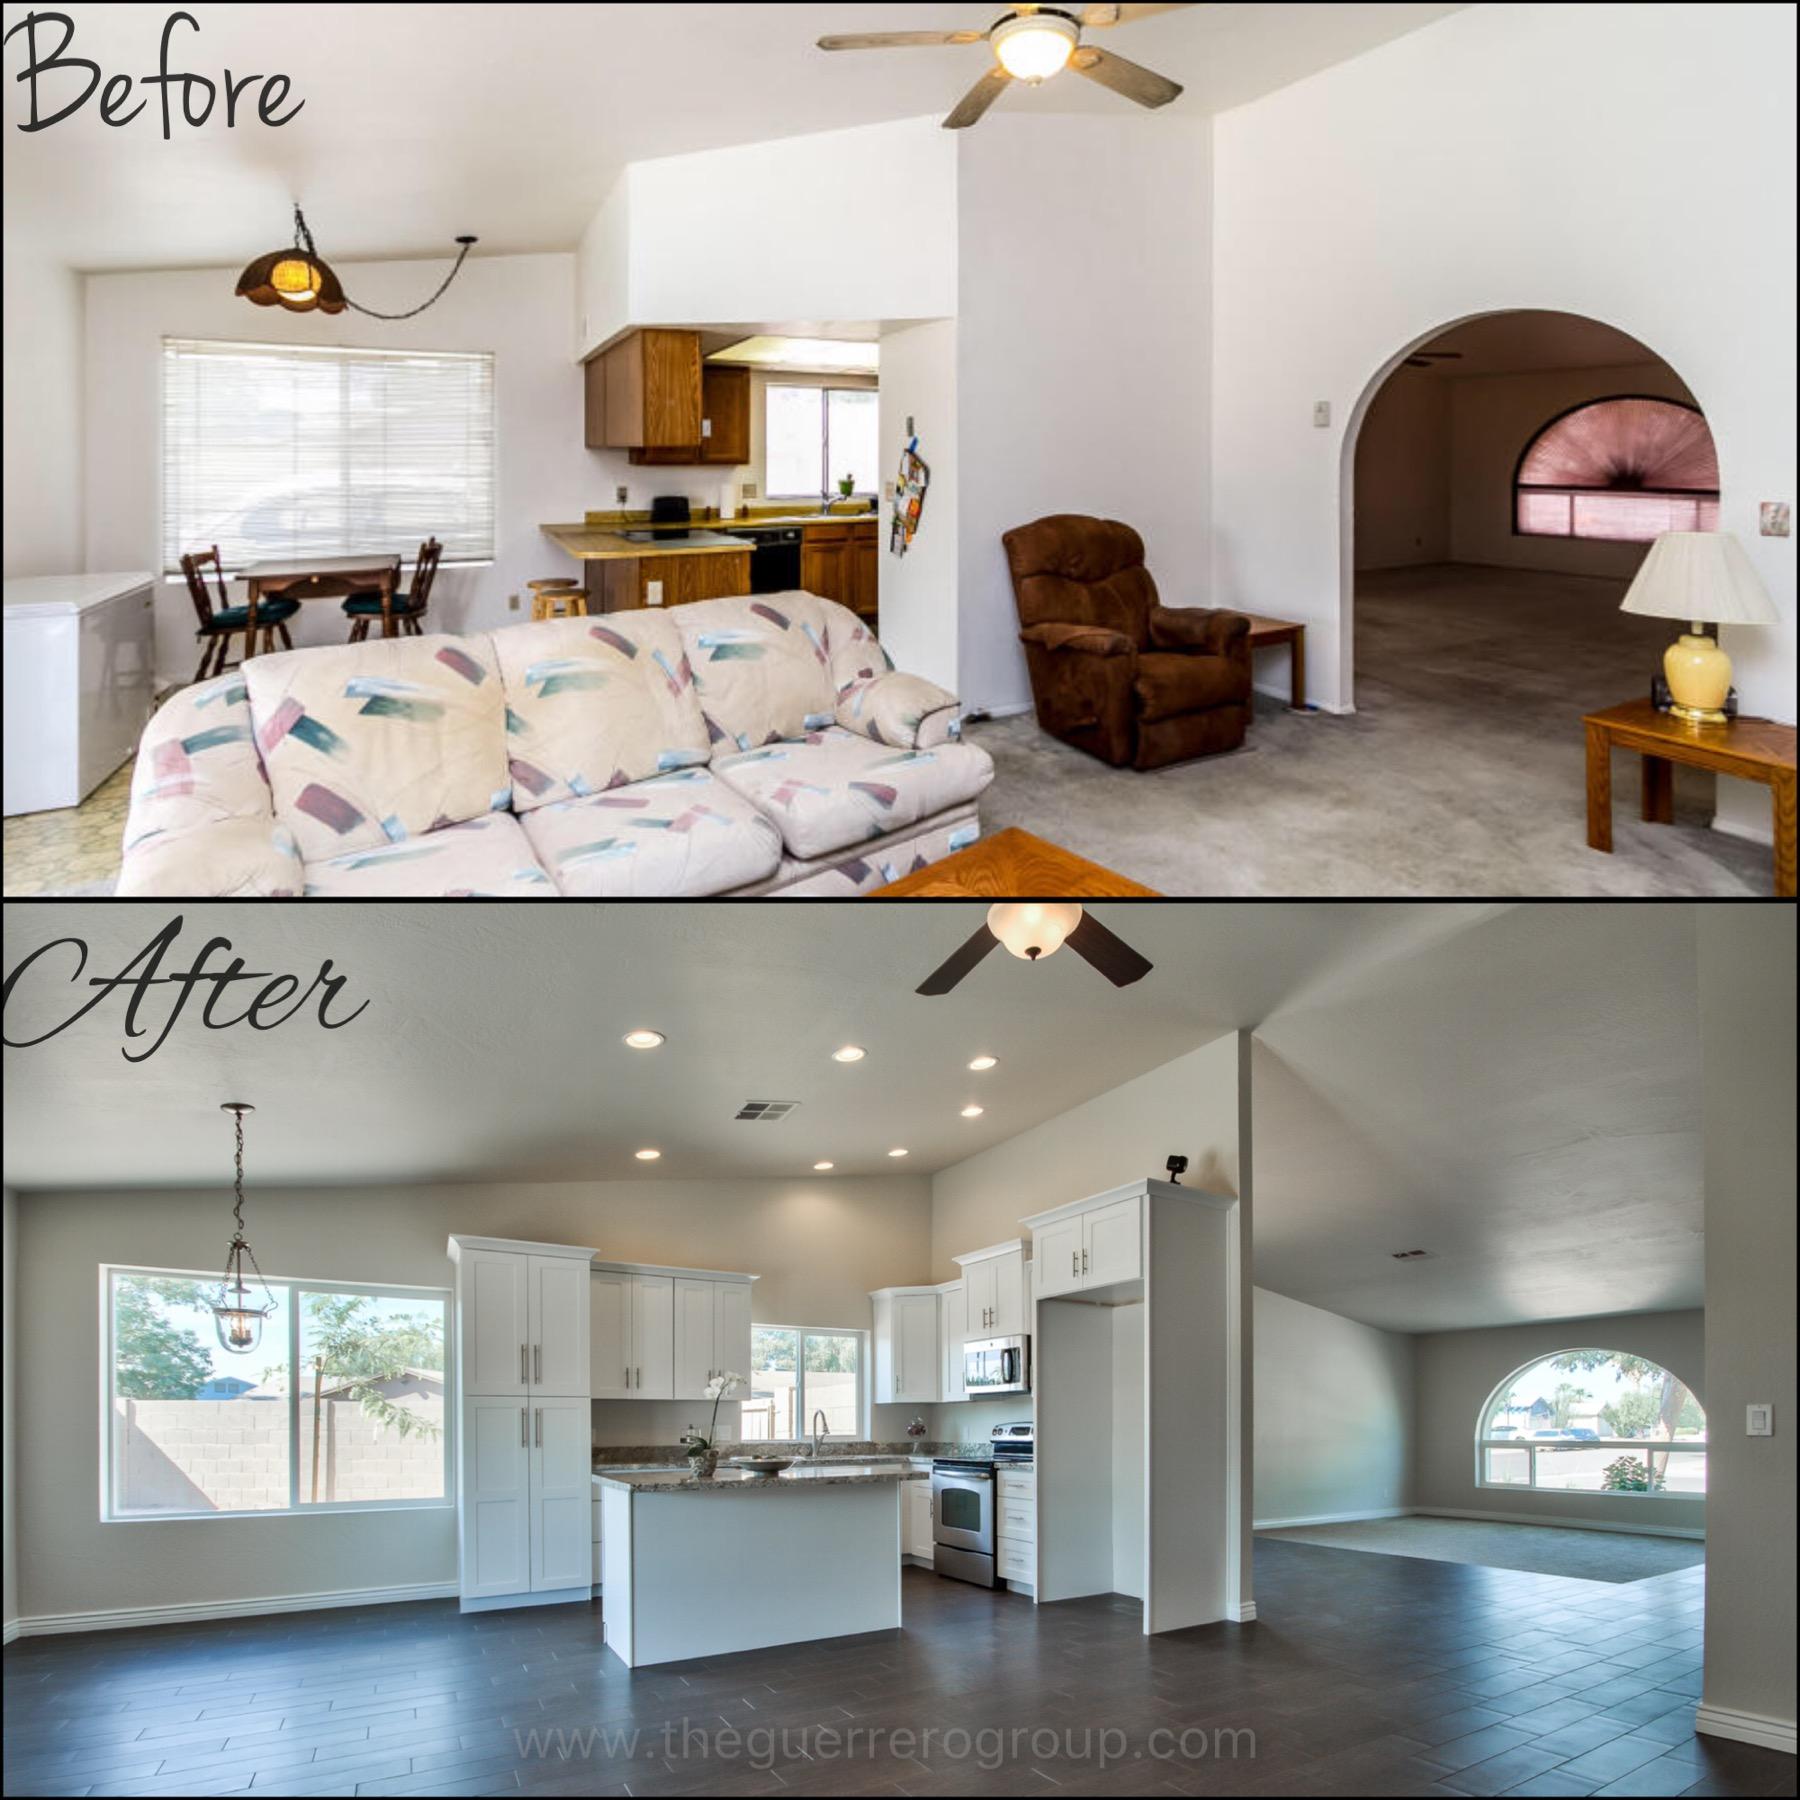 Residential Real Estate Investing In Arizona